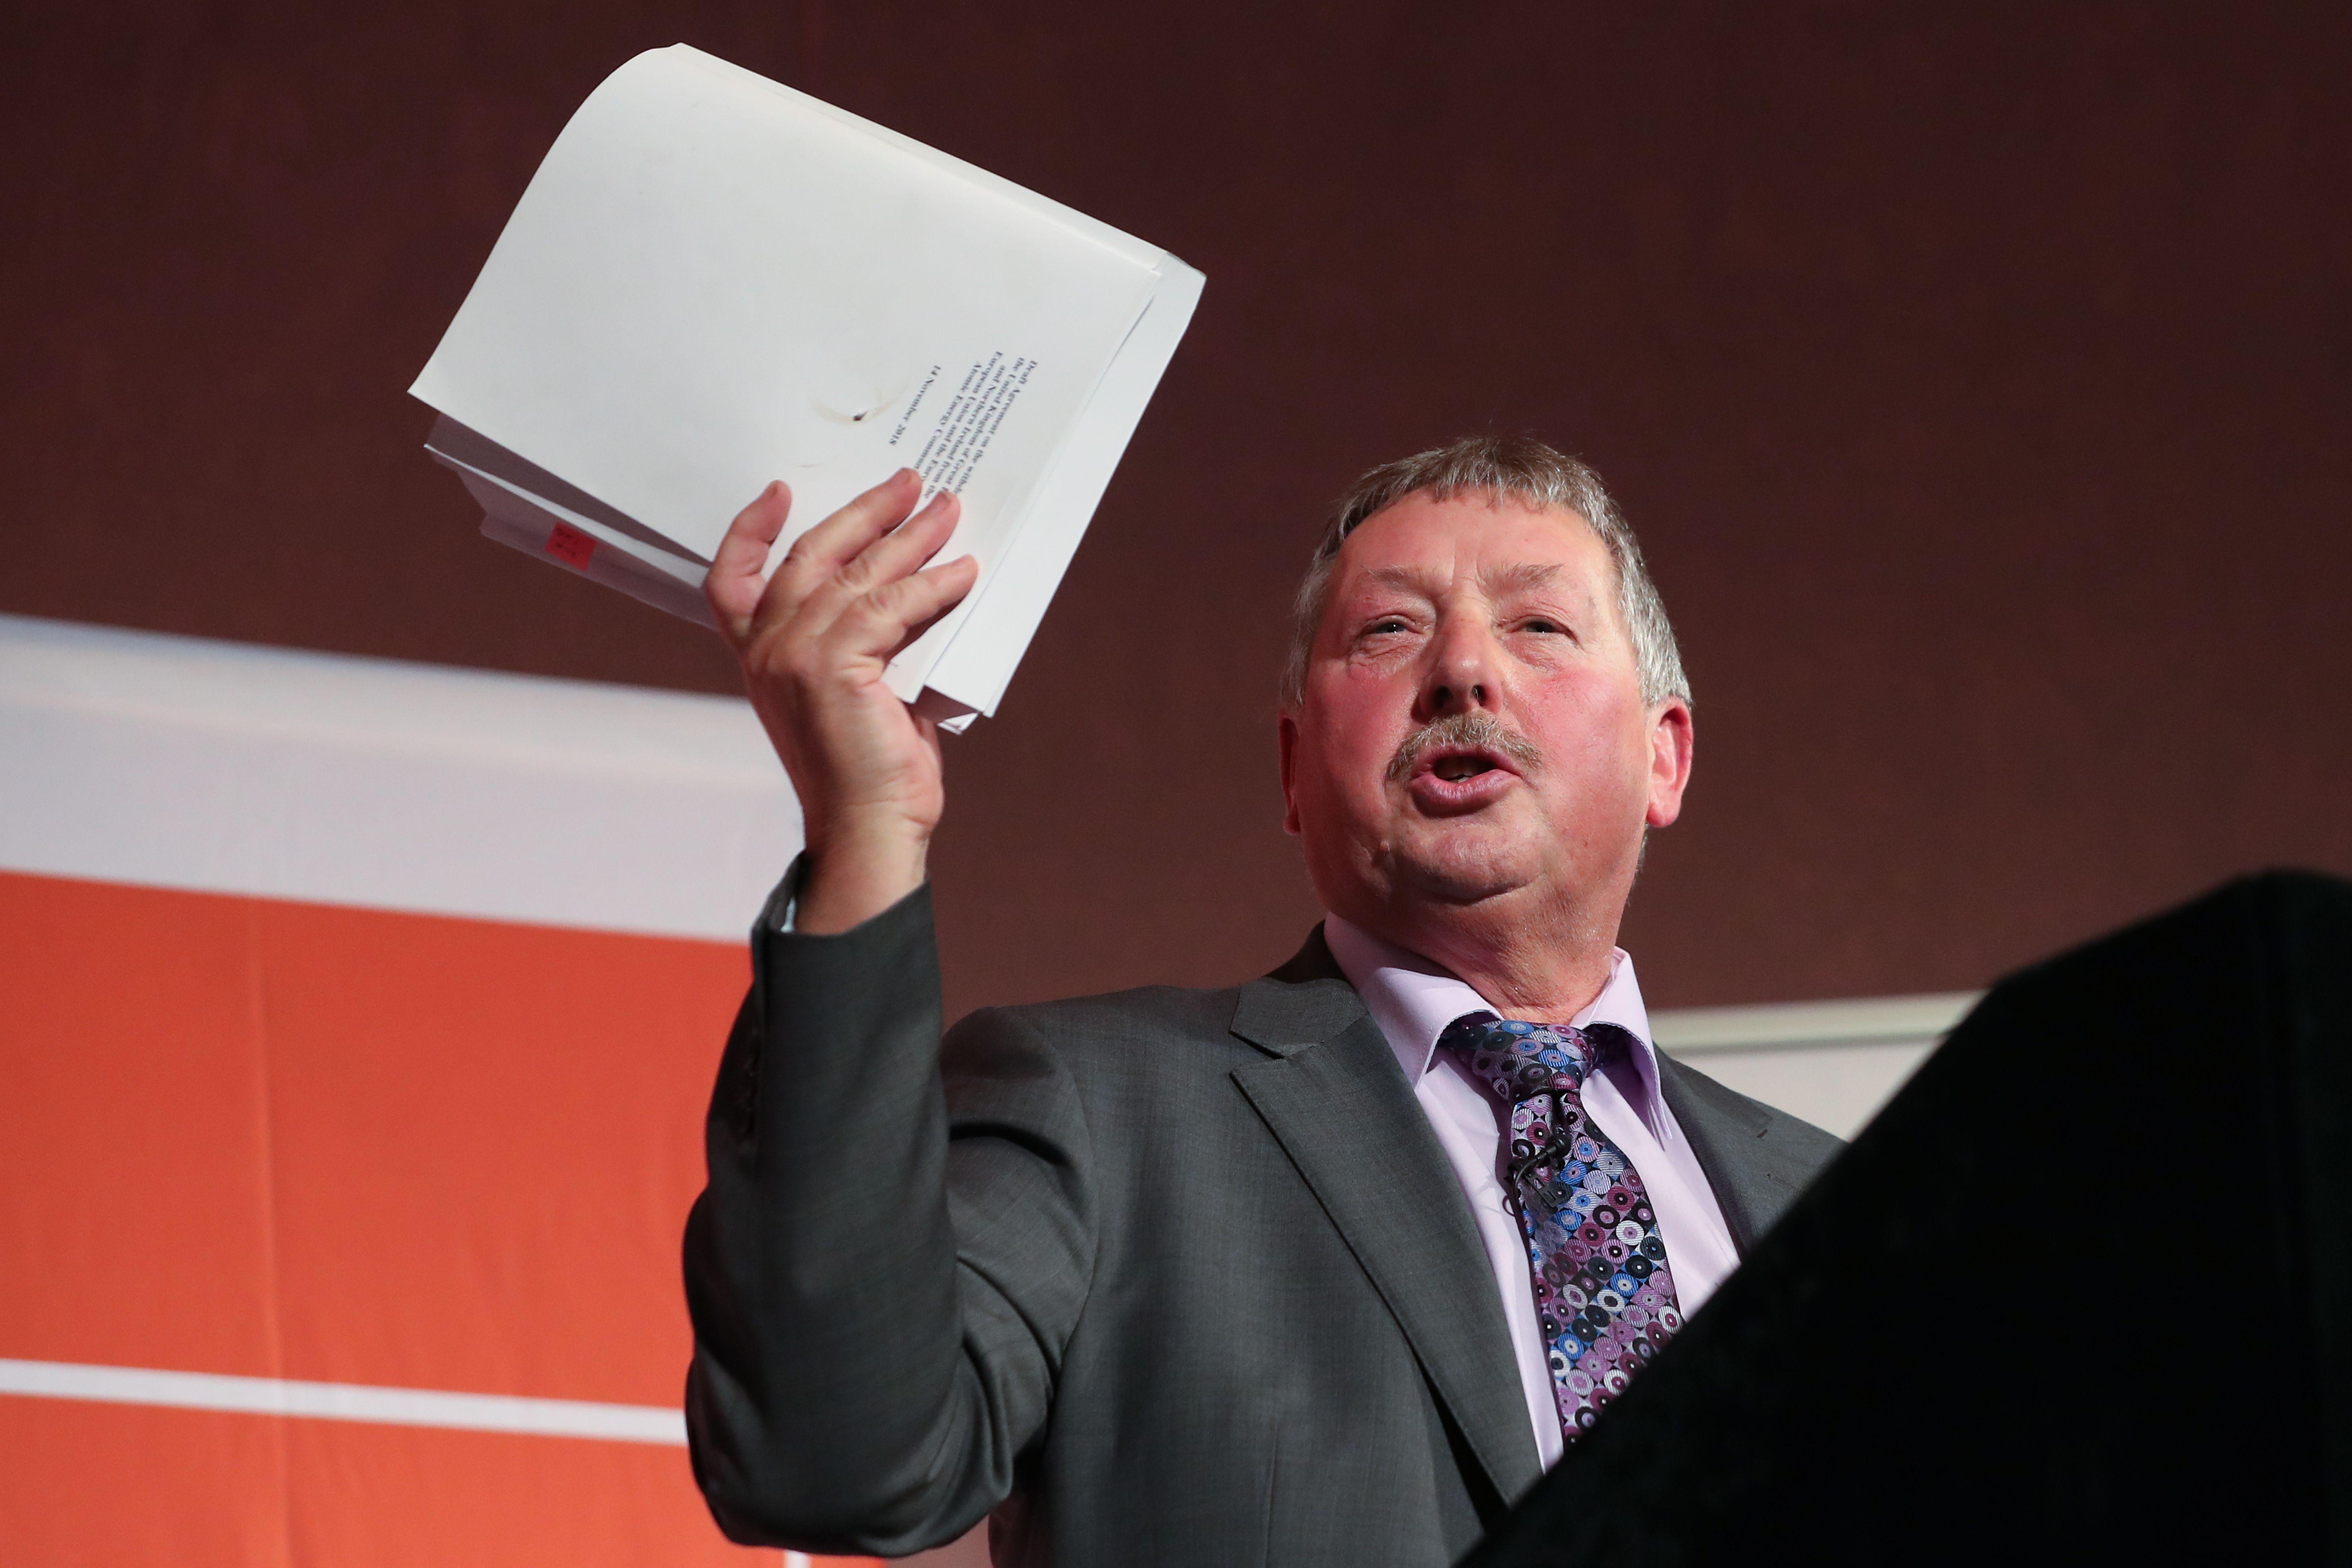 The DUP's Westminster leader Sammy Wilson.